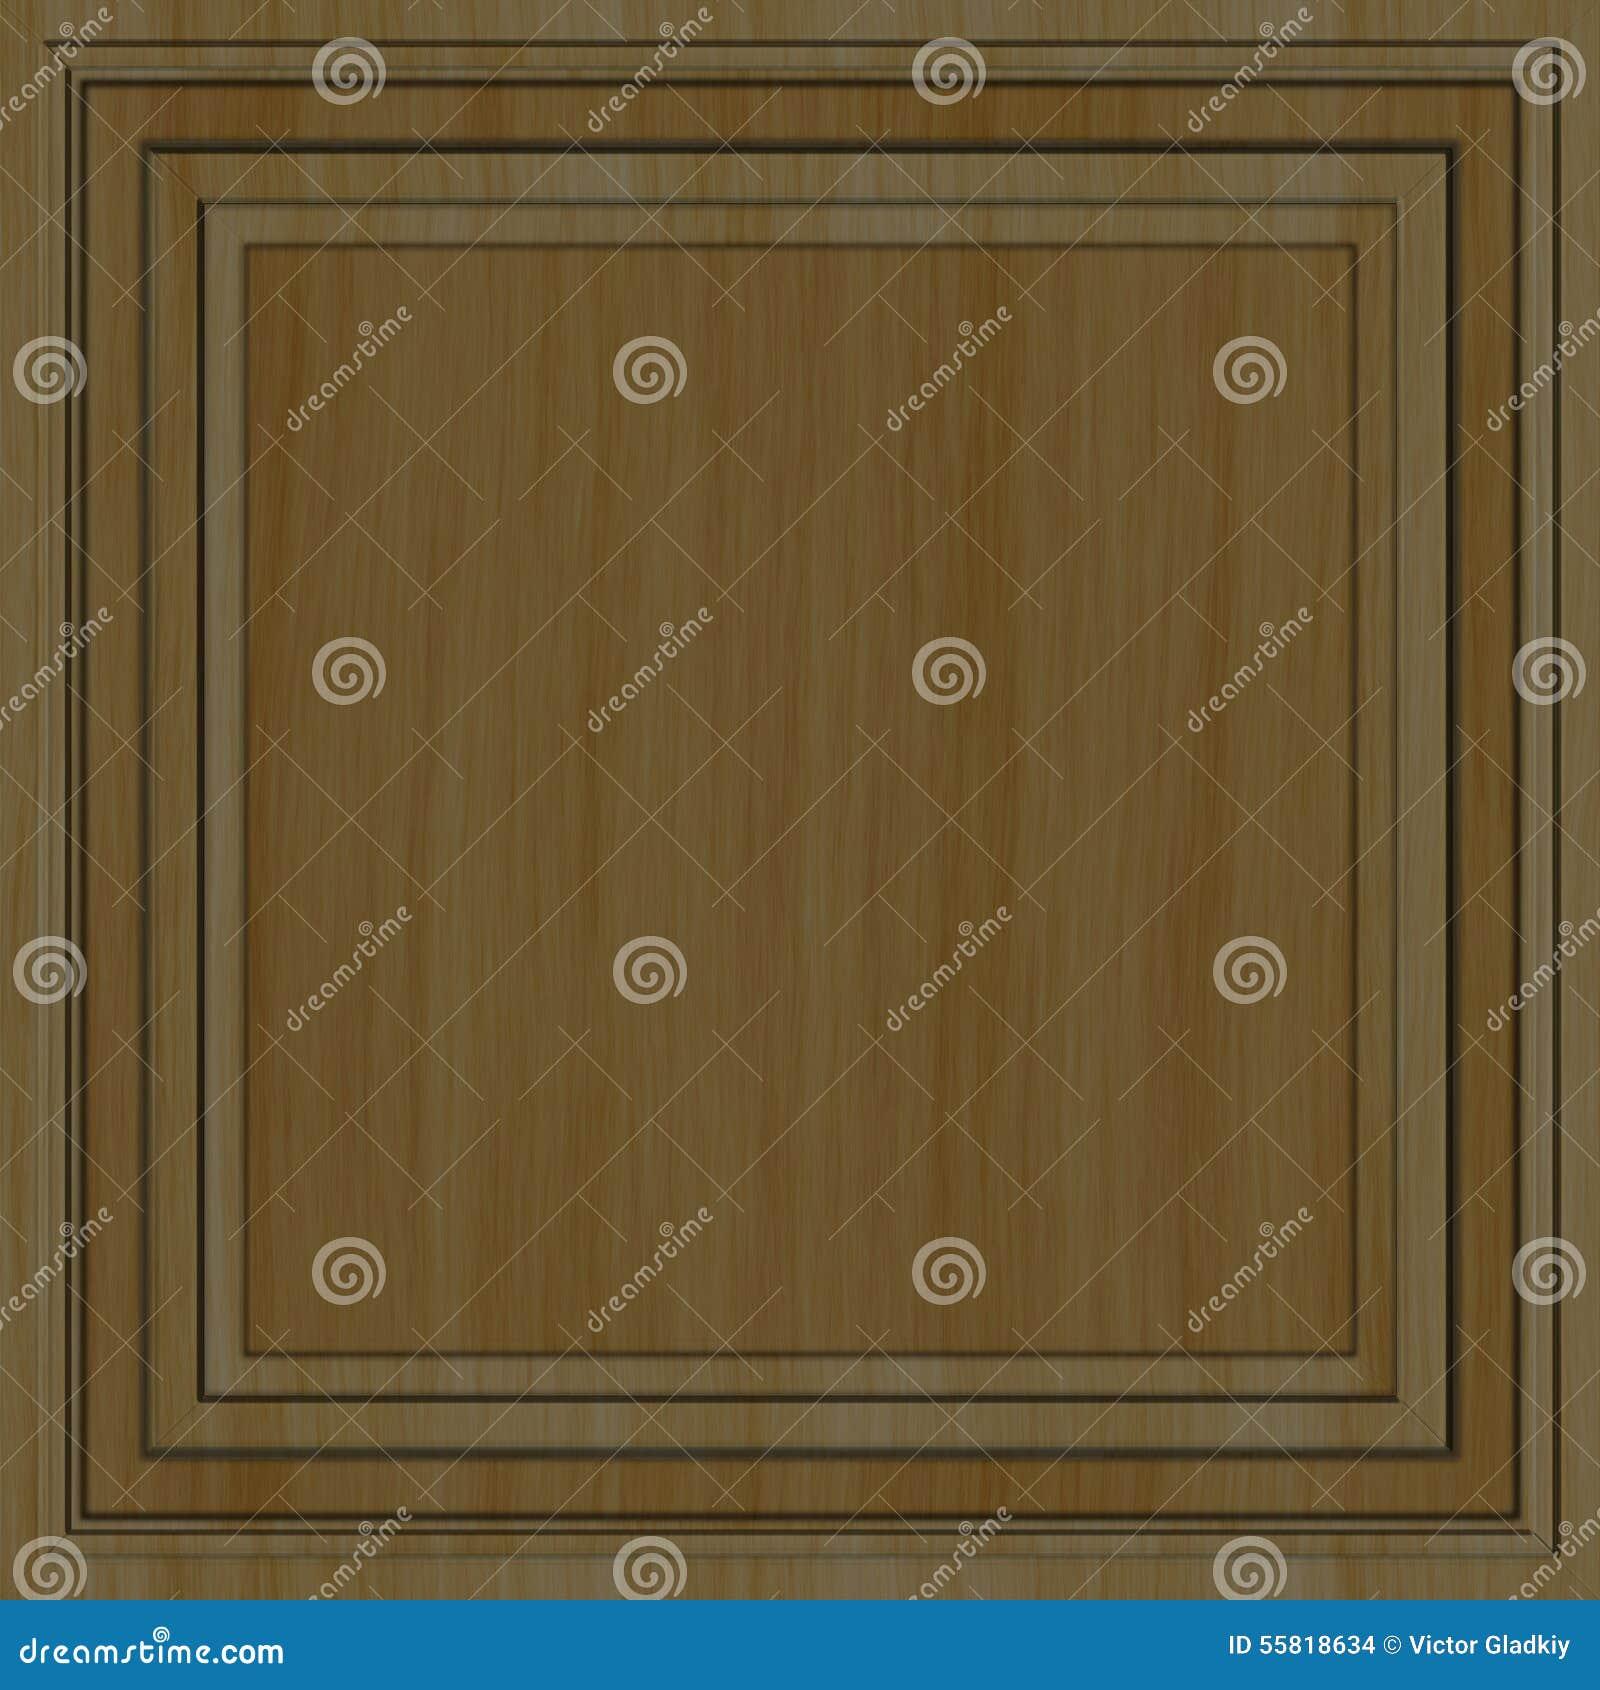 panneau en bois d coratif illustration stock image 55818634. Black Bedroom Furniture Sets. Home Design Ideas